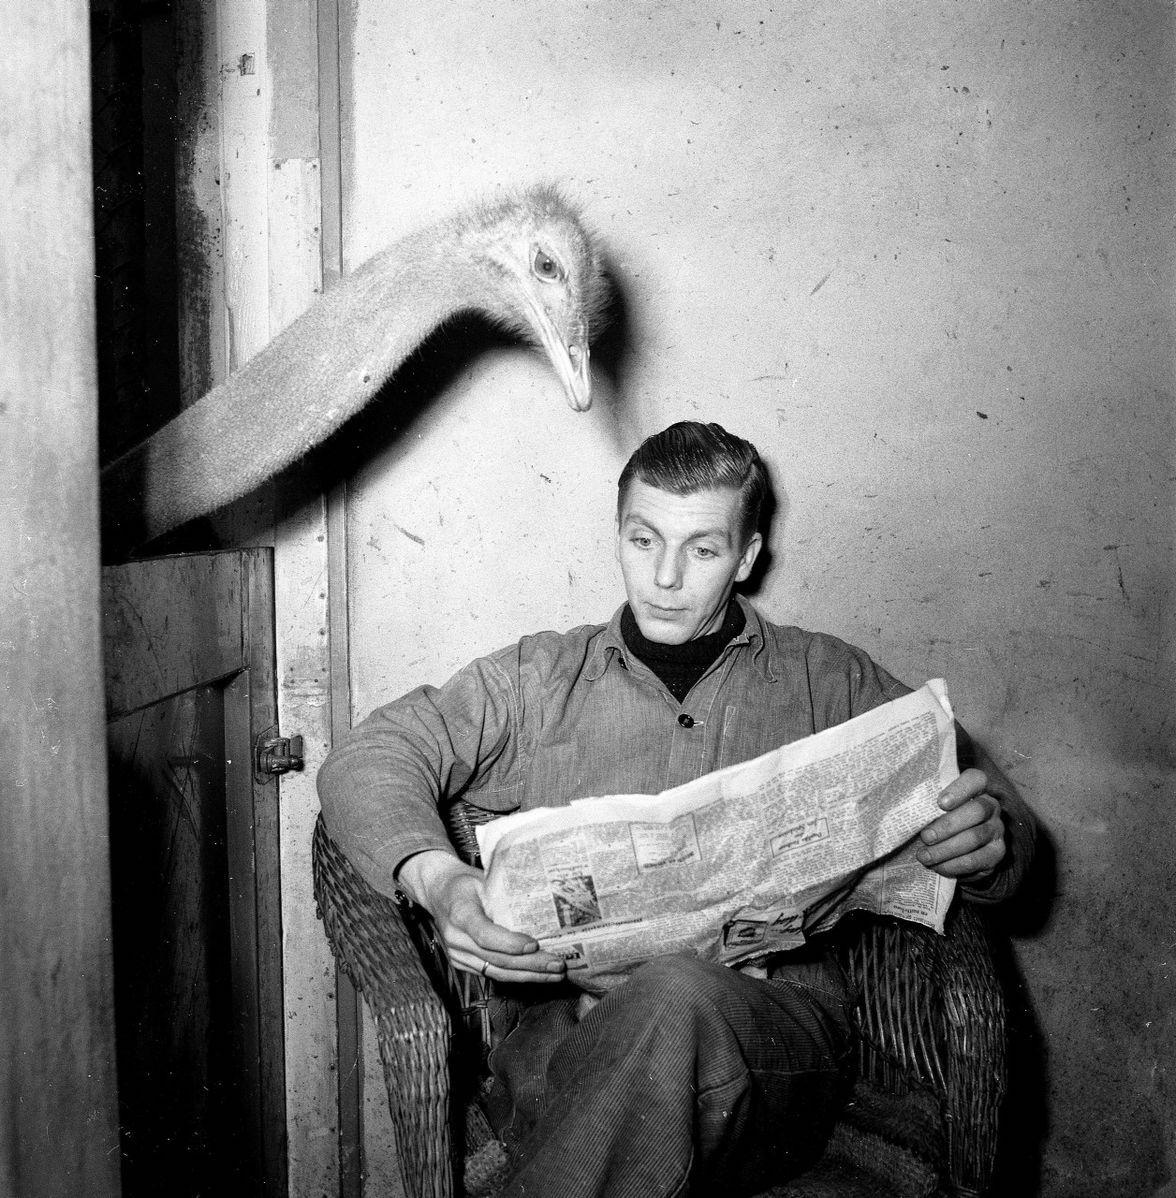 ostrich reads newspaper over man's shoulder